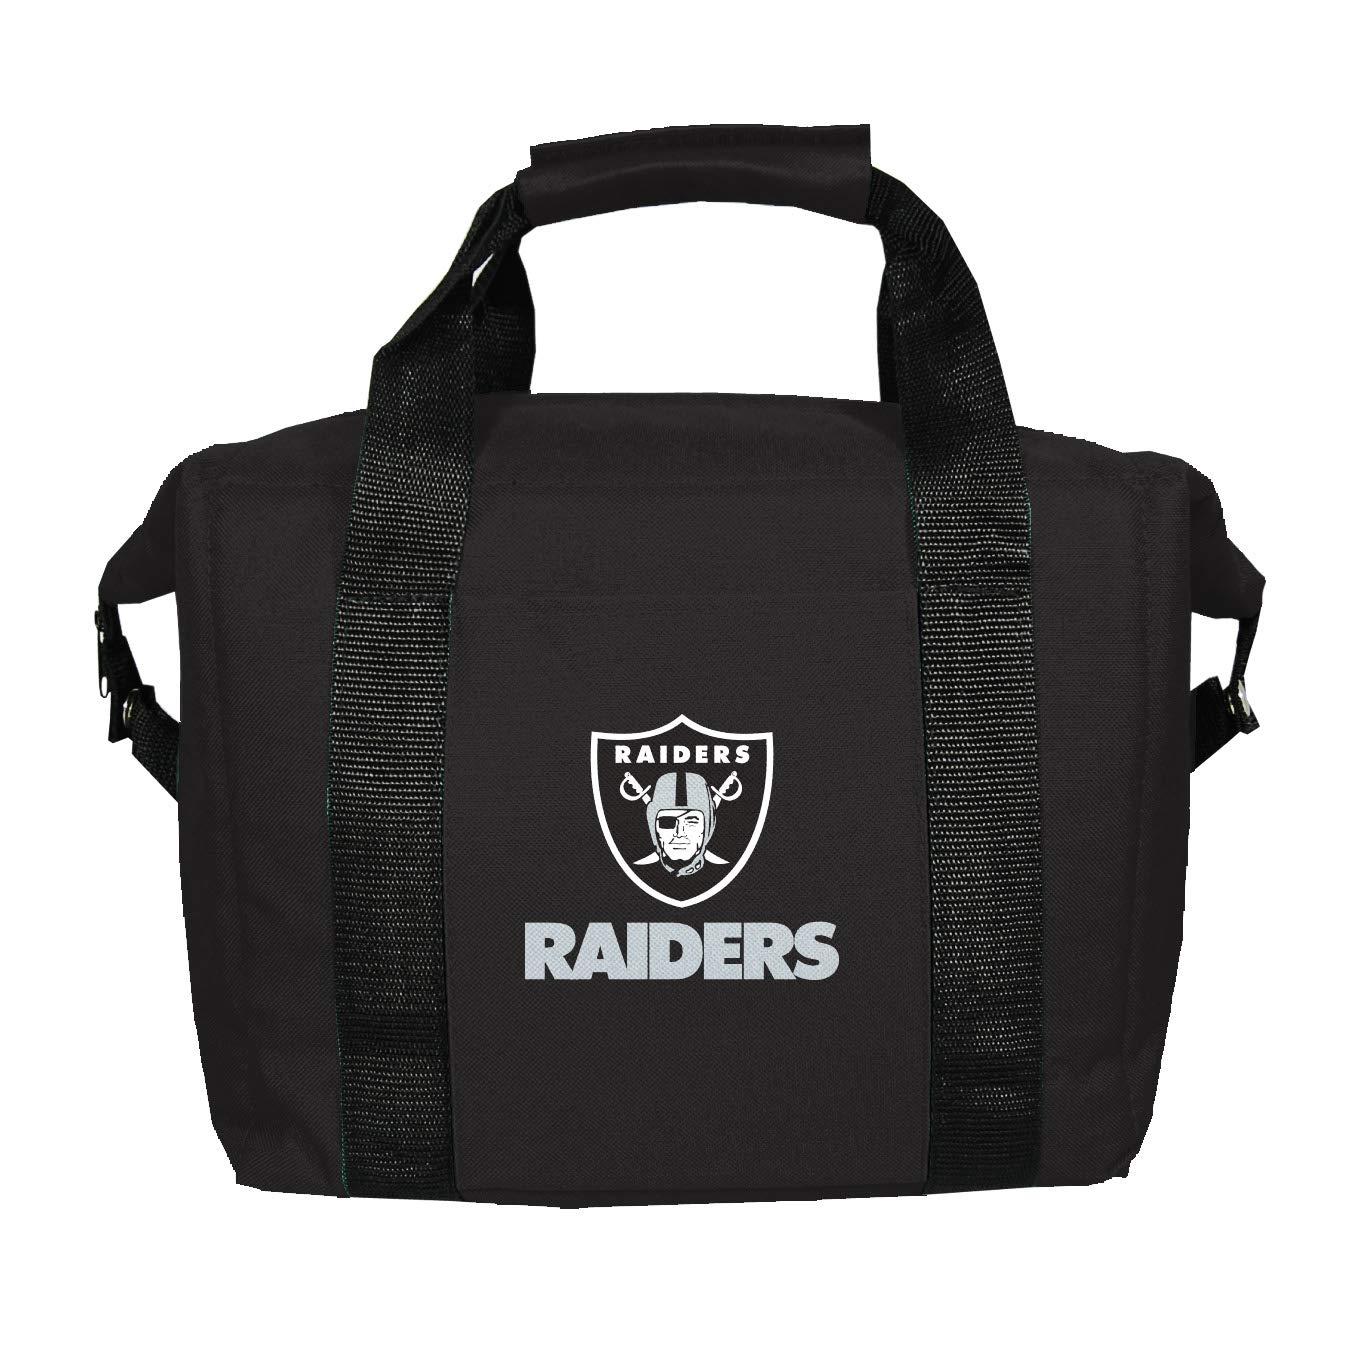 Kolder NFL Atlanta Falcons Weiche Seiten Kühltasche